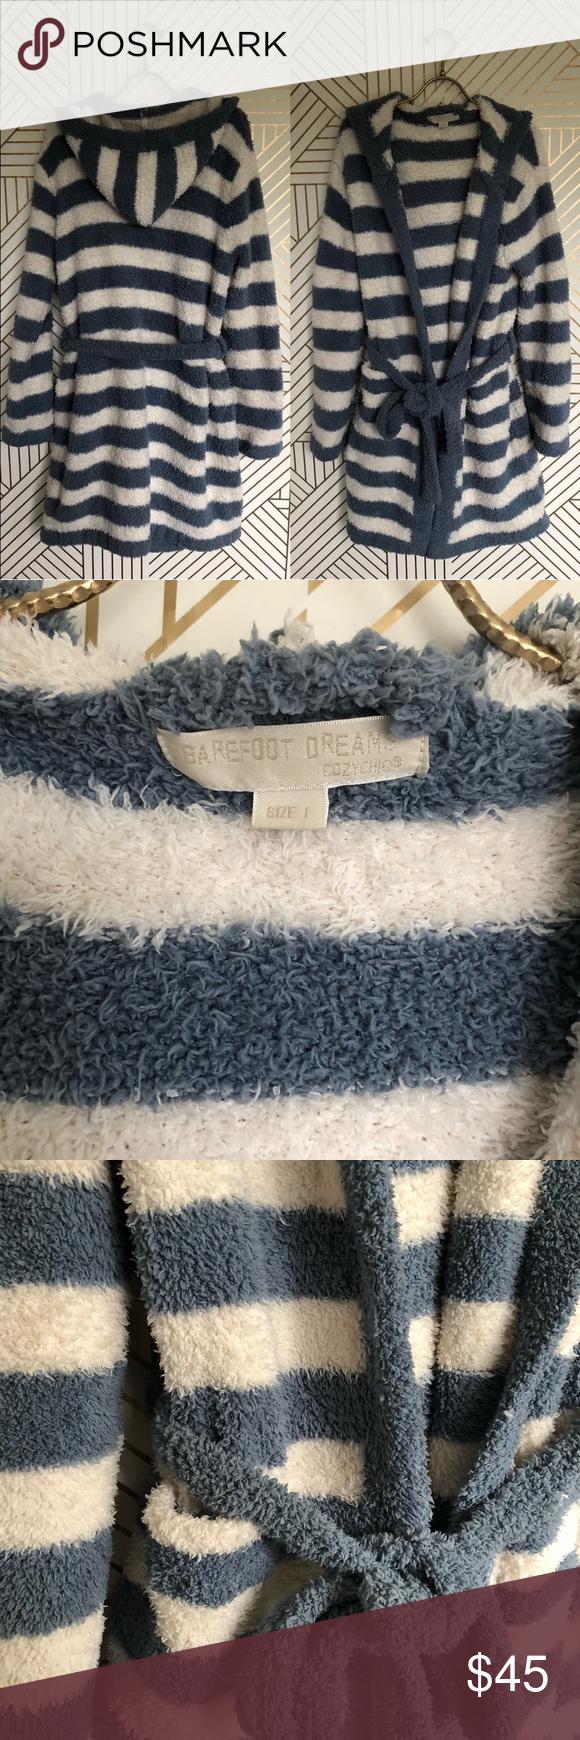 Barefoot dreams cozy chic robe Sz 1 | My Posh Closet | Pinterest